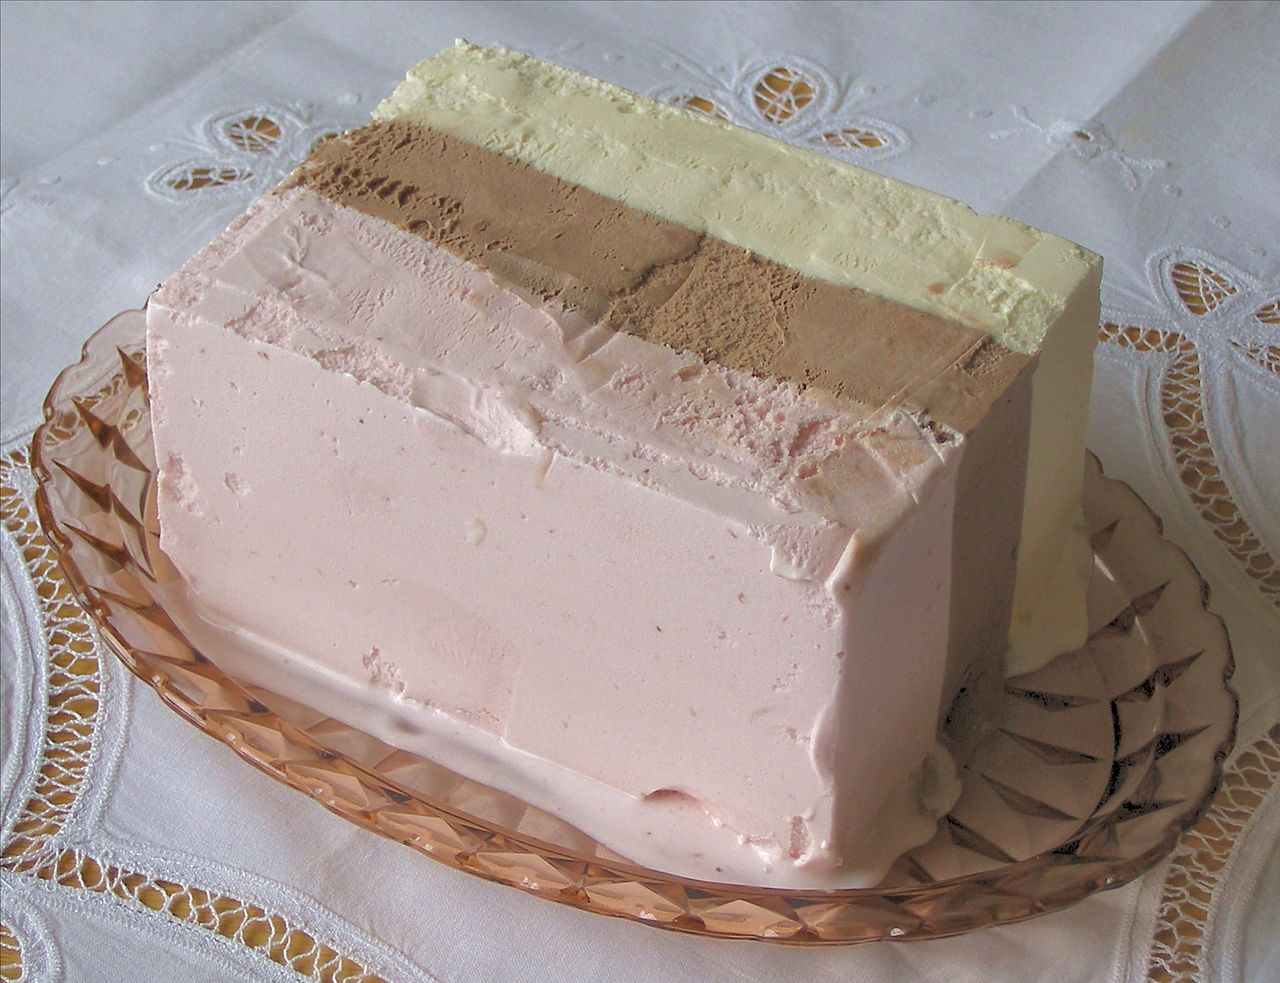 Neapolitan Ice Cream Cake Pan